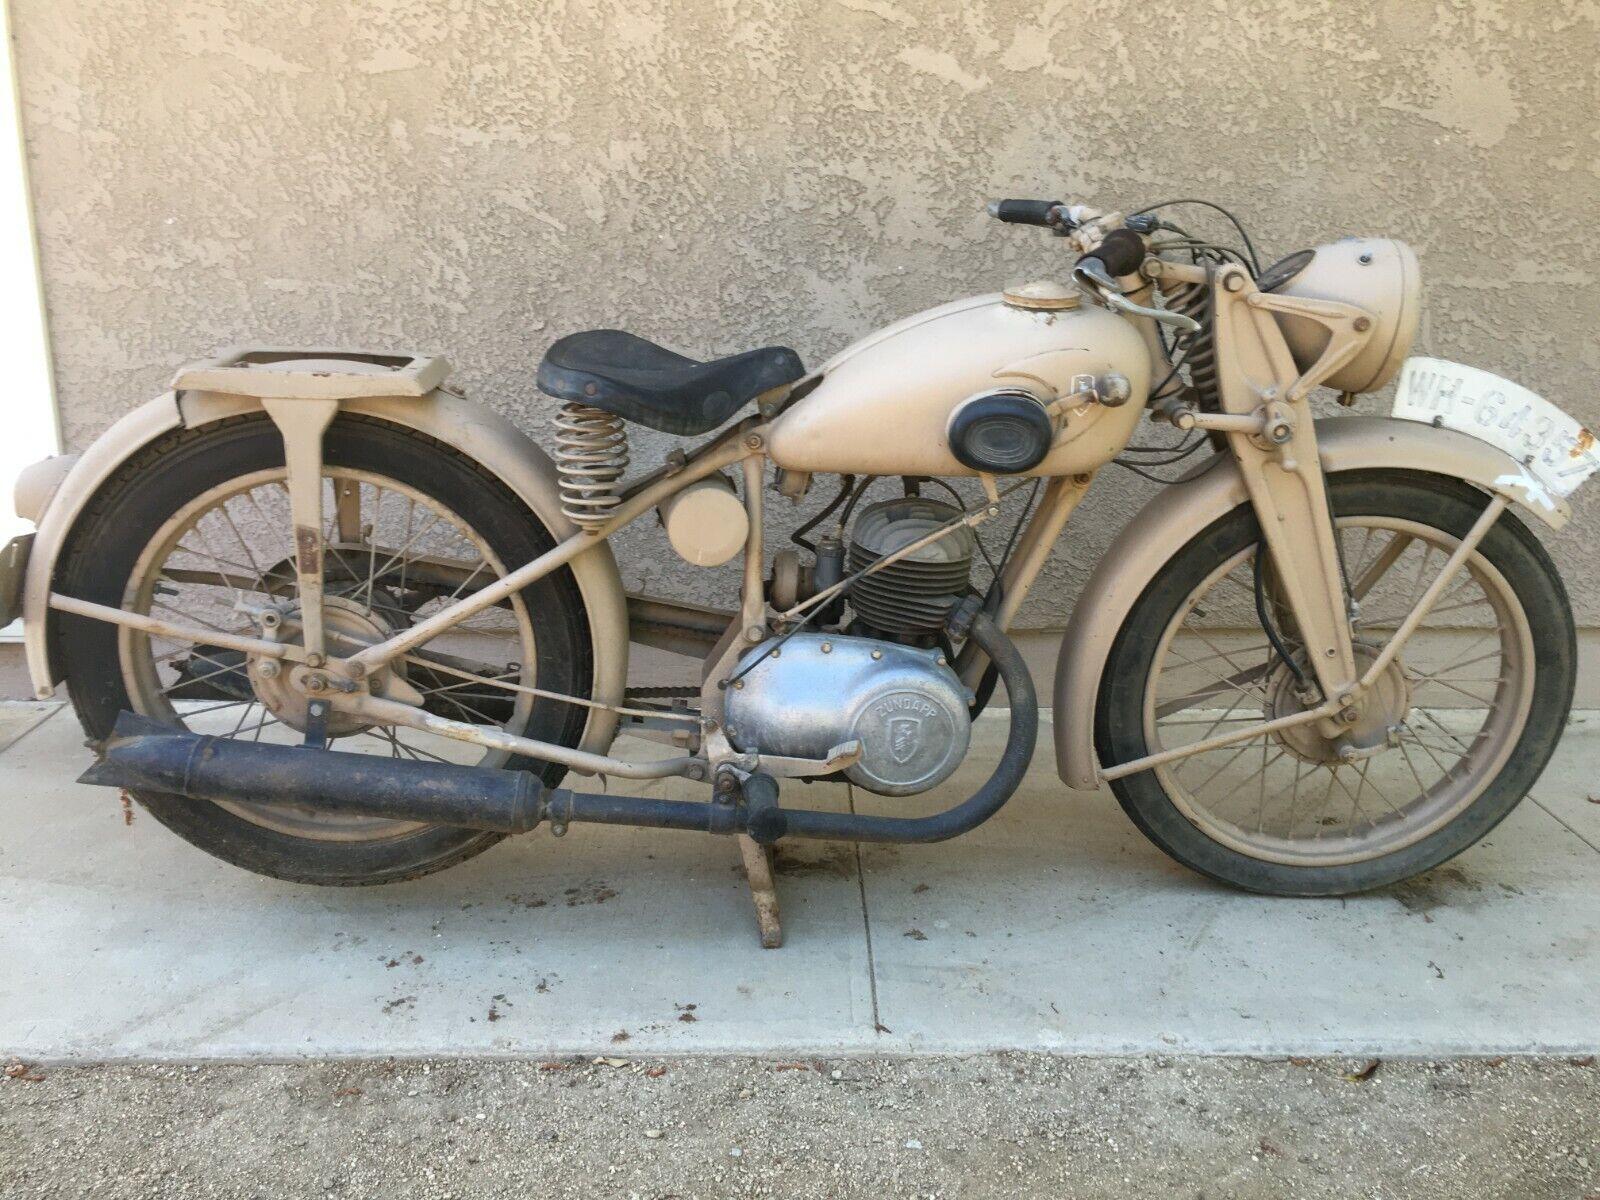 Zundapp Model DB200 T 200cc Motorcycle Post War Desert Tan Runs Needs Work